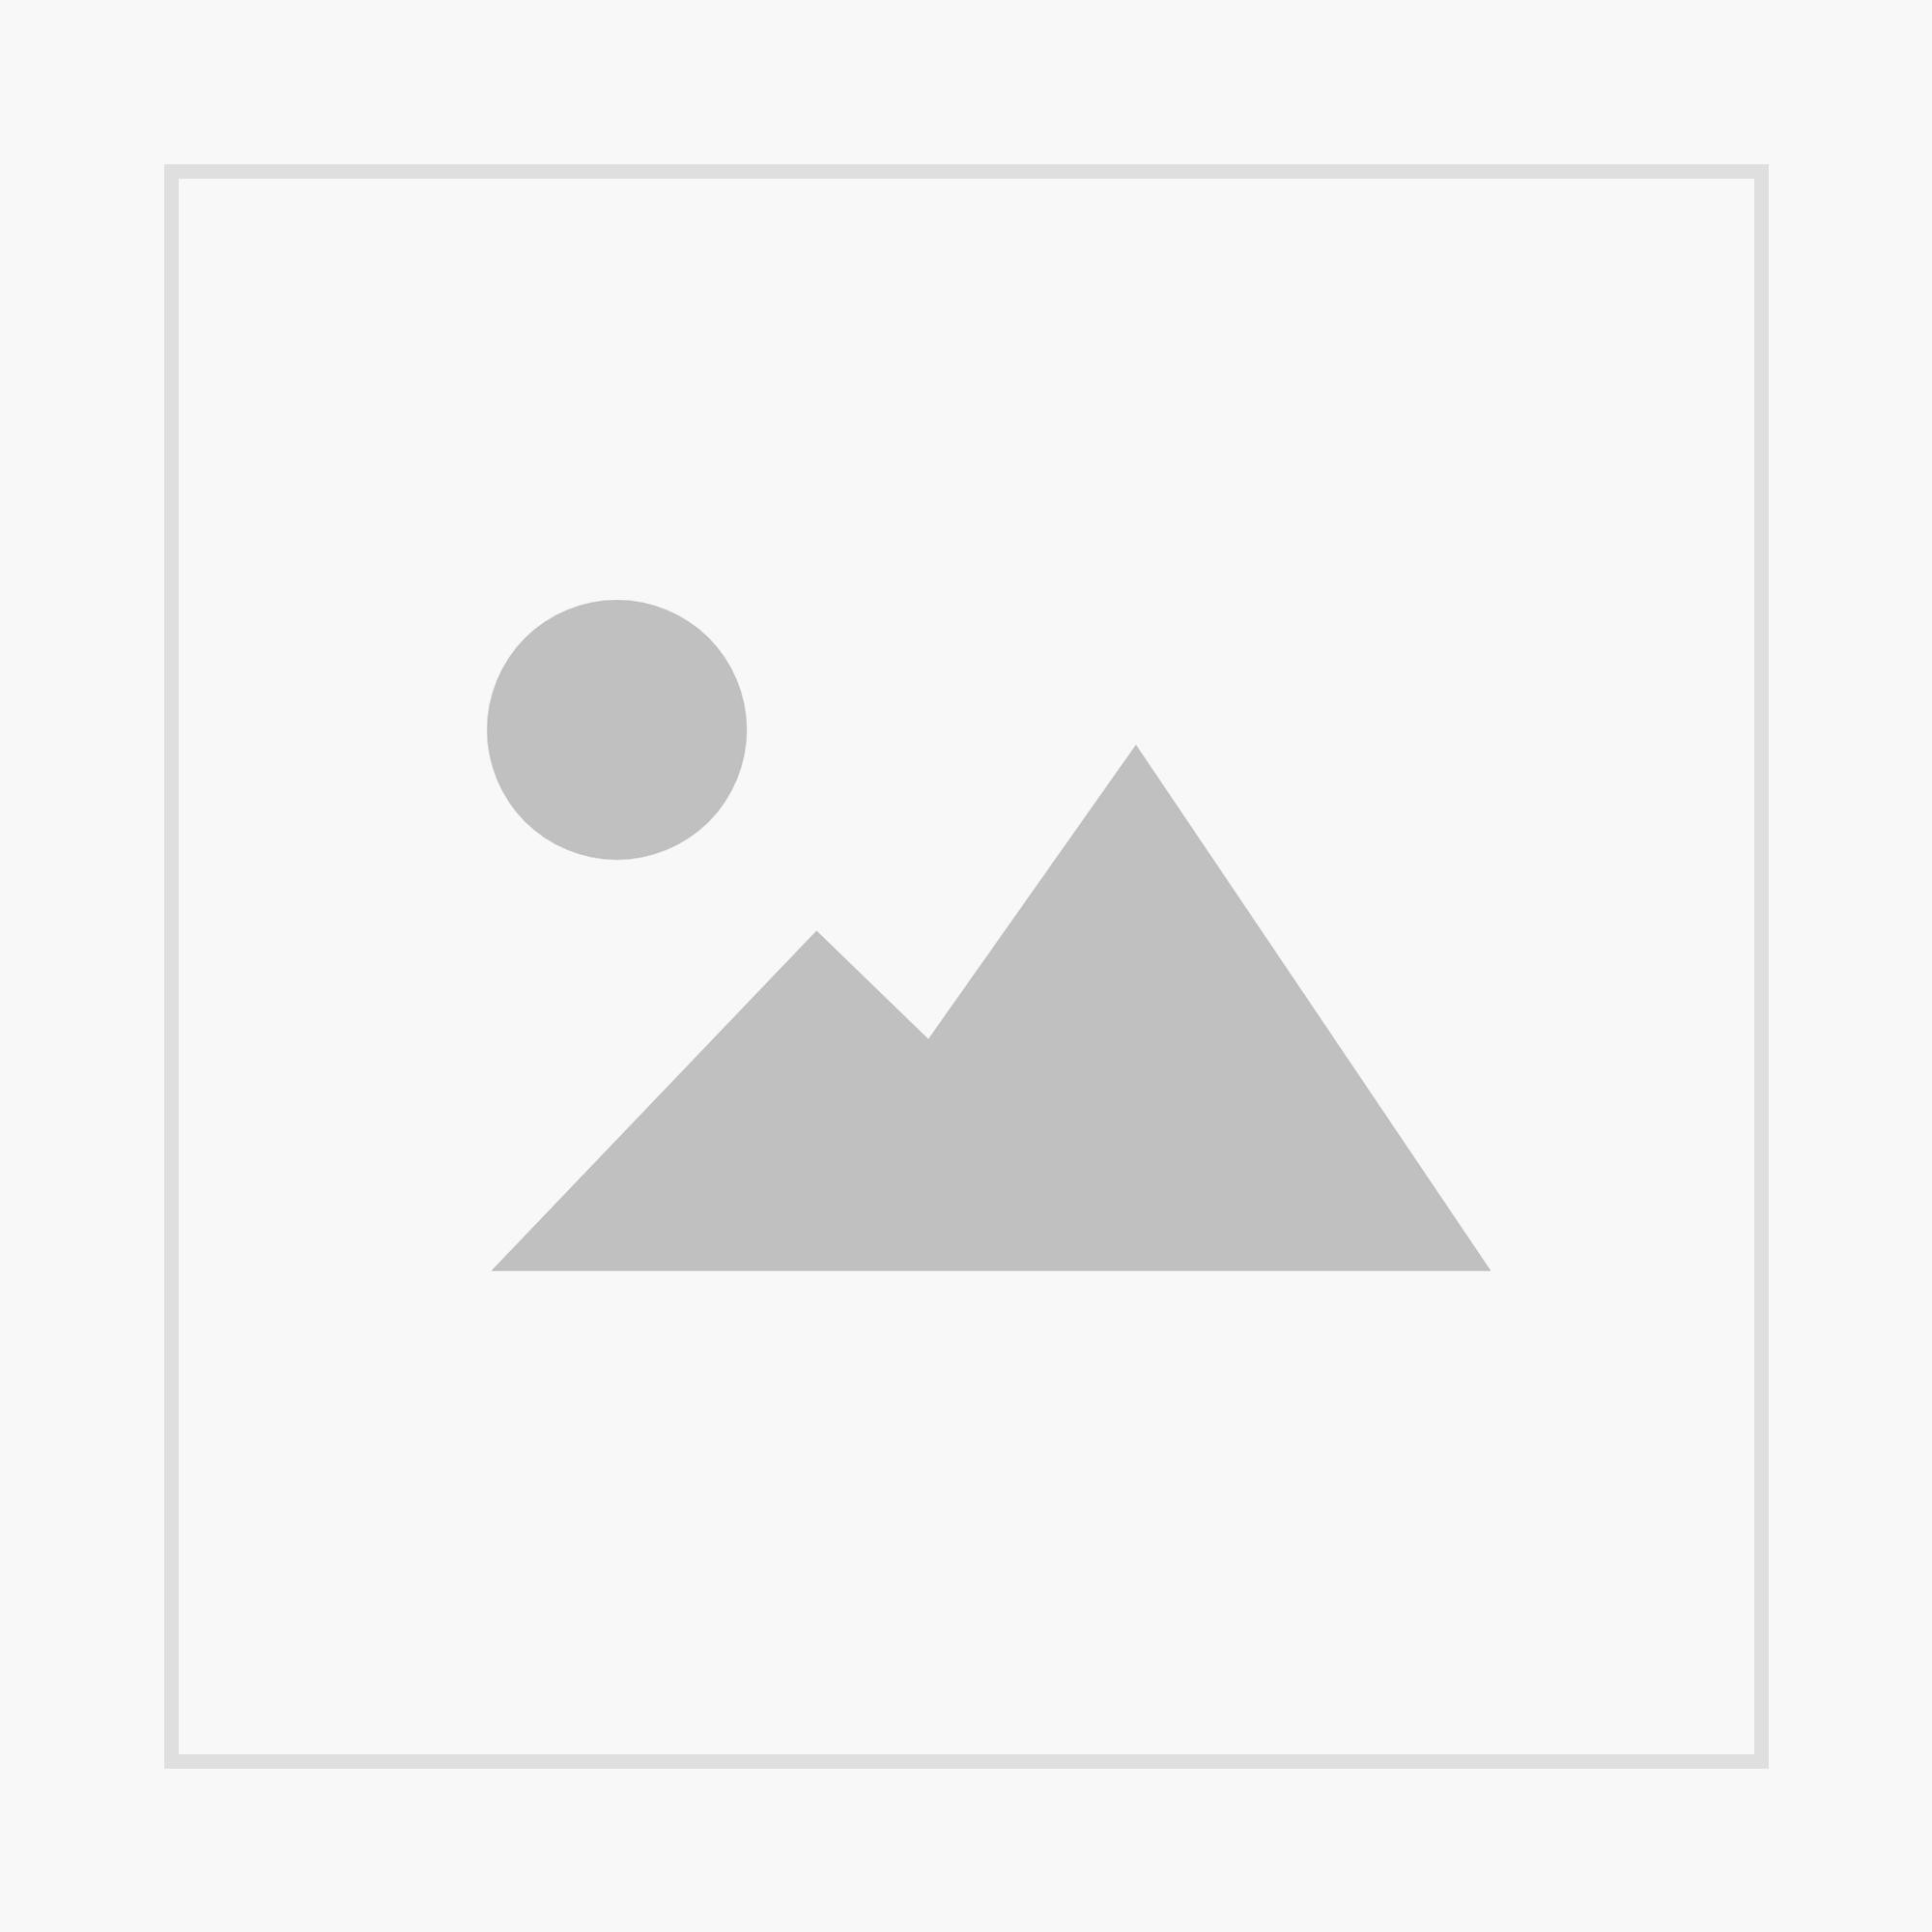 Land & Berge 6/2021